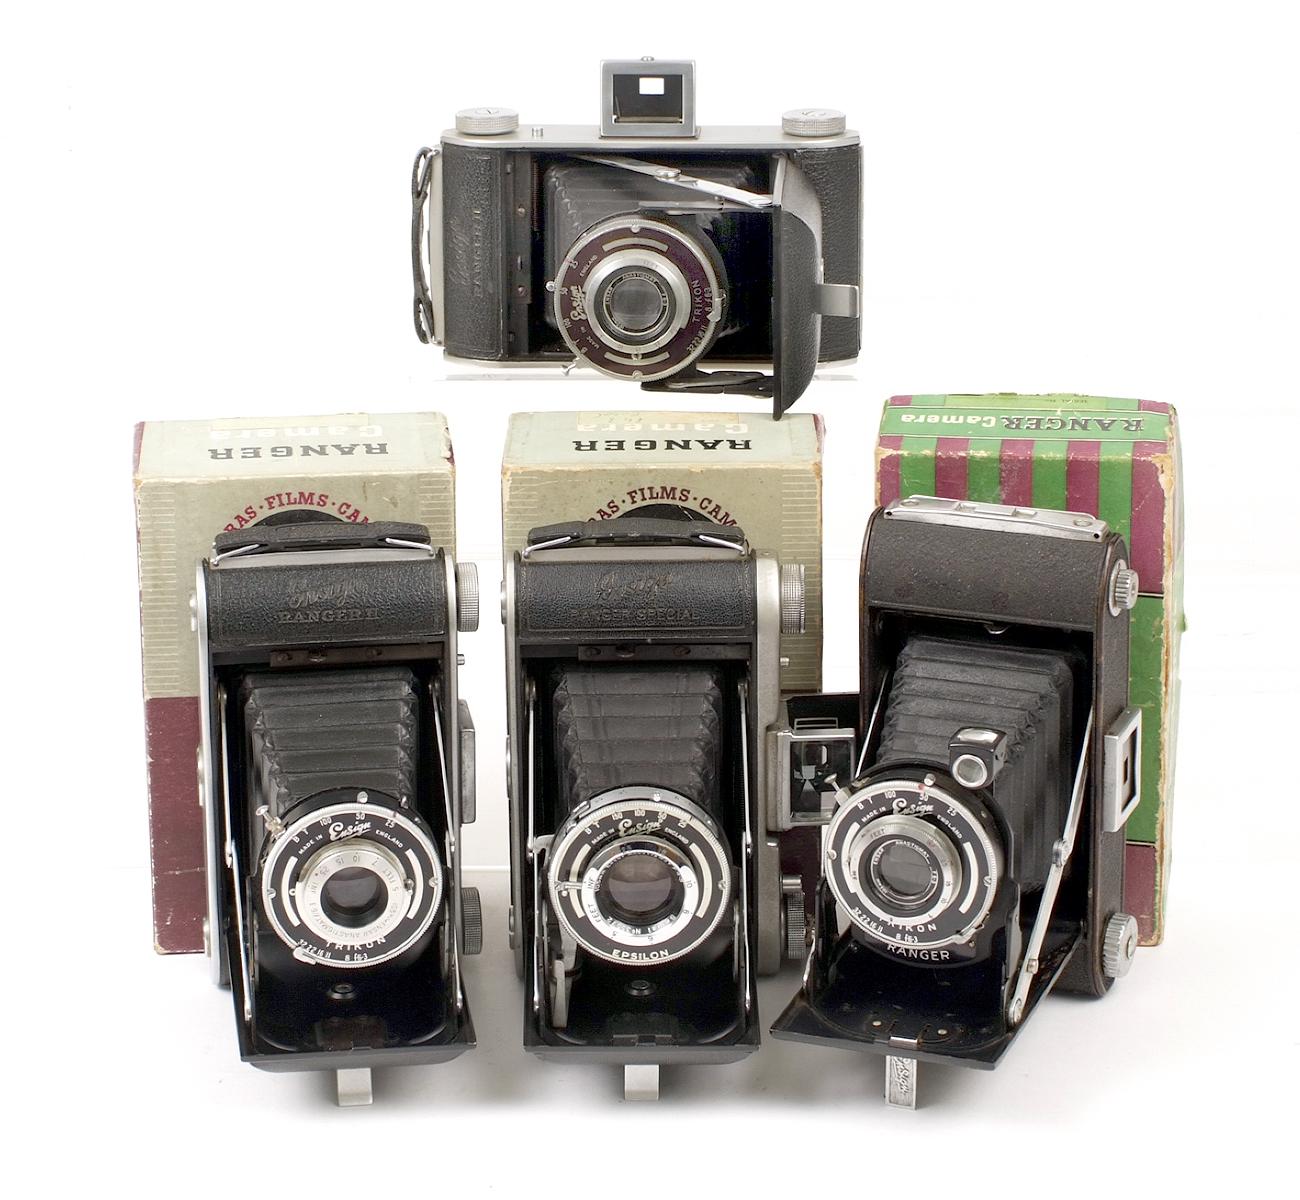 Lot 10 - Four Ensign Ranger Folding Roll Film Cameras. Ranger, boxed (condition 6F); 2x Ranger II, boxed (